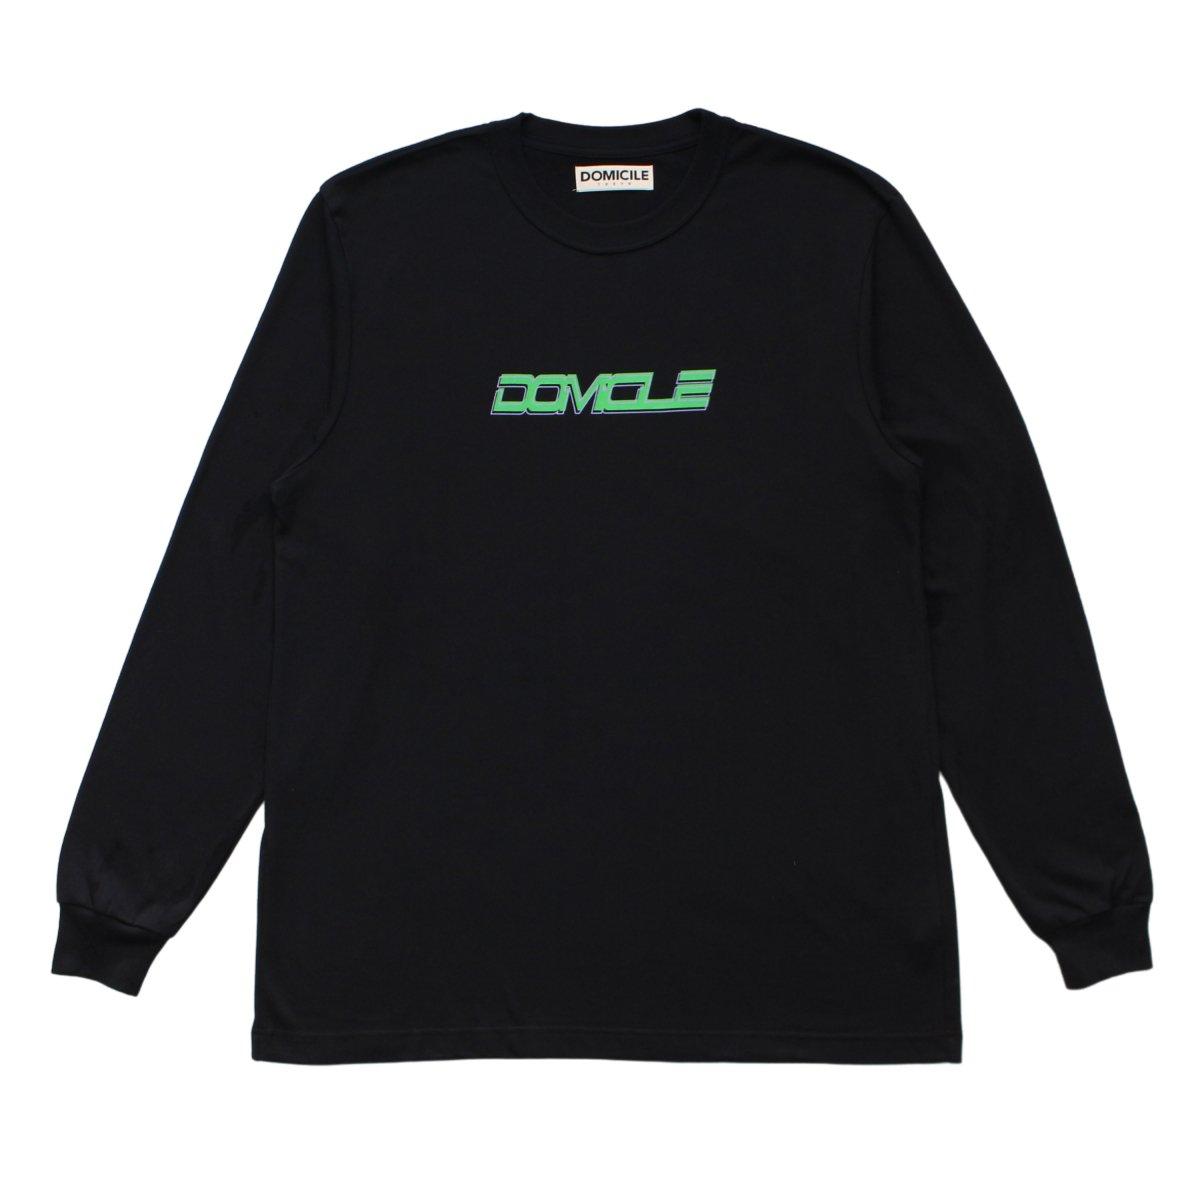 DOMICILE2020 L/S TEE【BLACK】